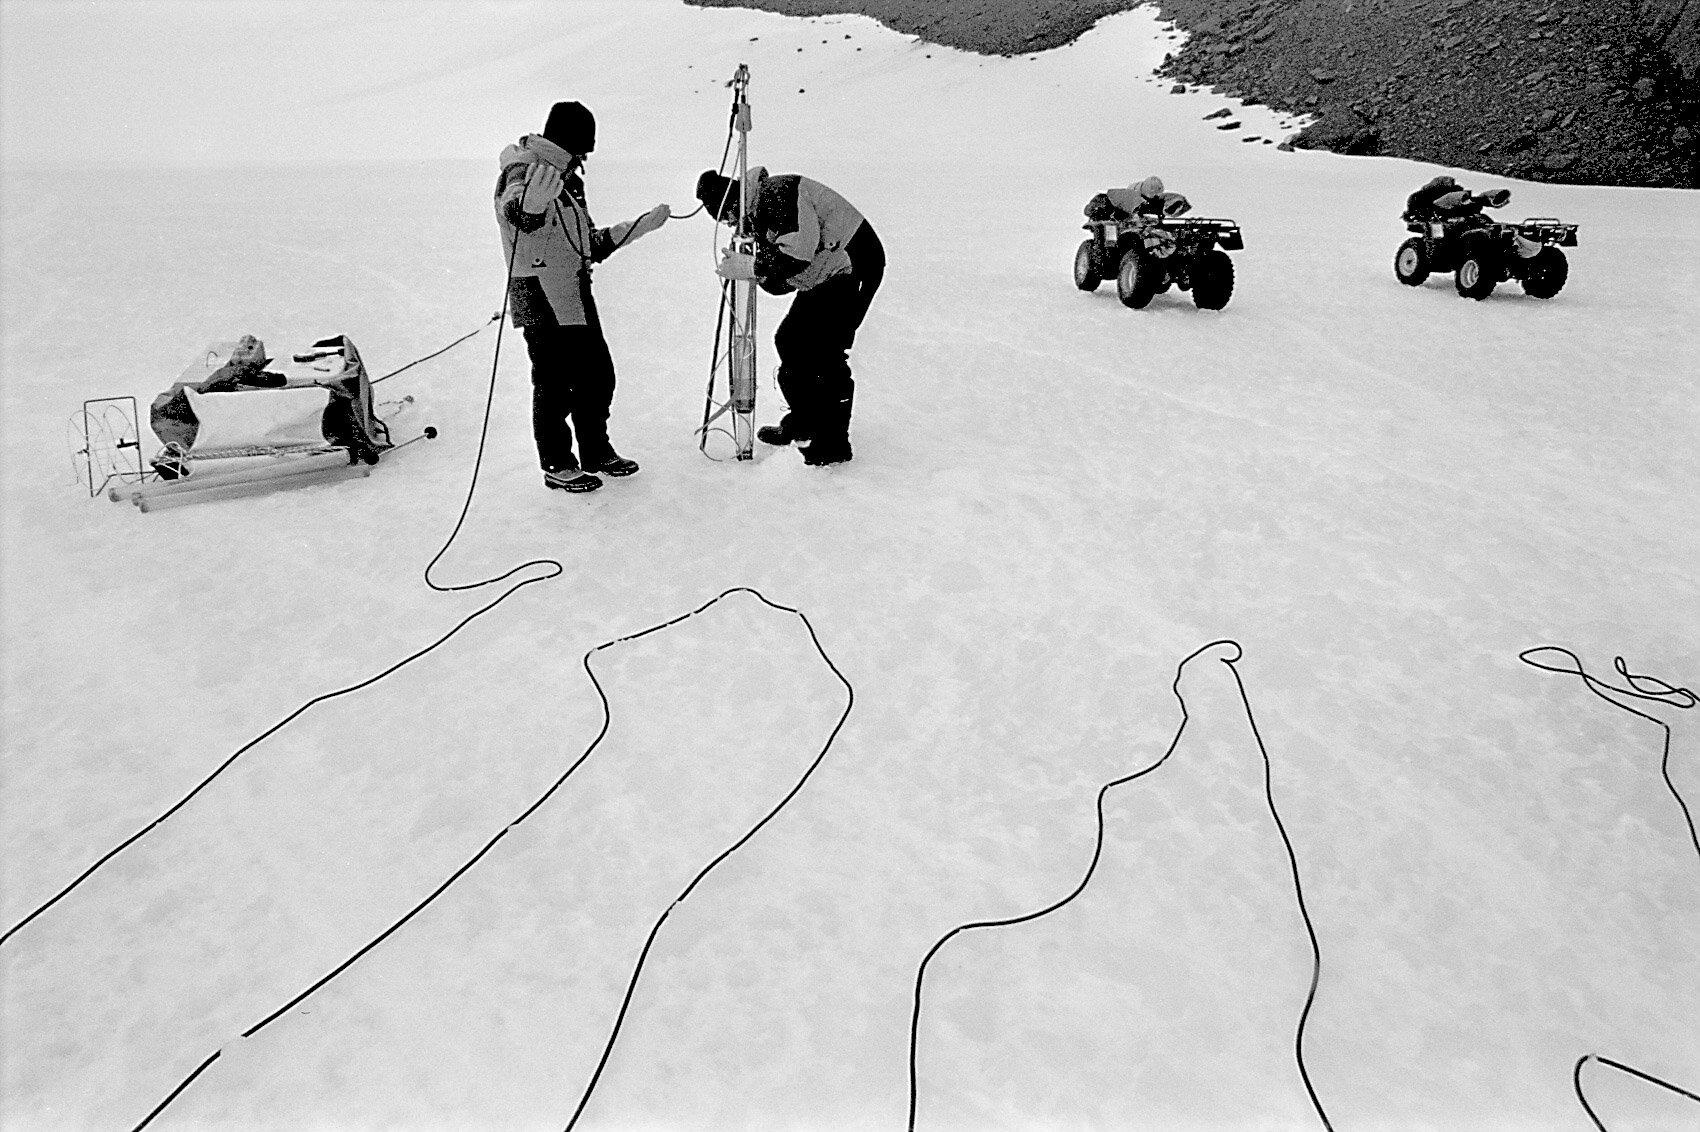 Researchers, Framnes Mountains, Antarctica. © www.thomaspickard.com